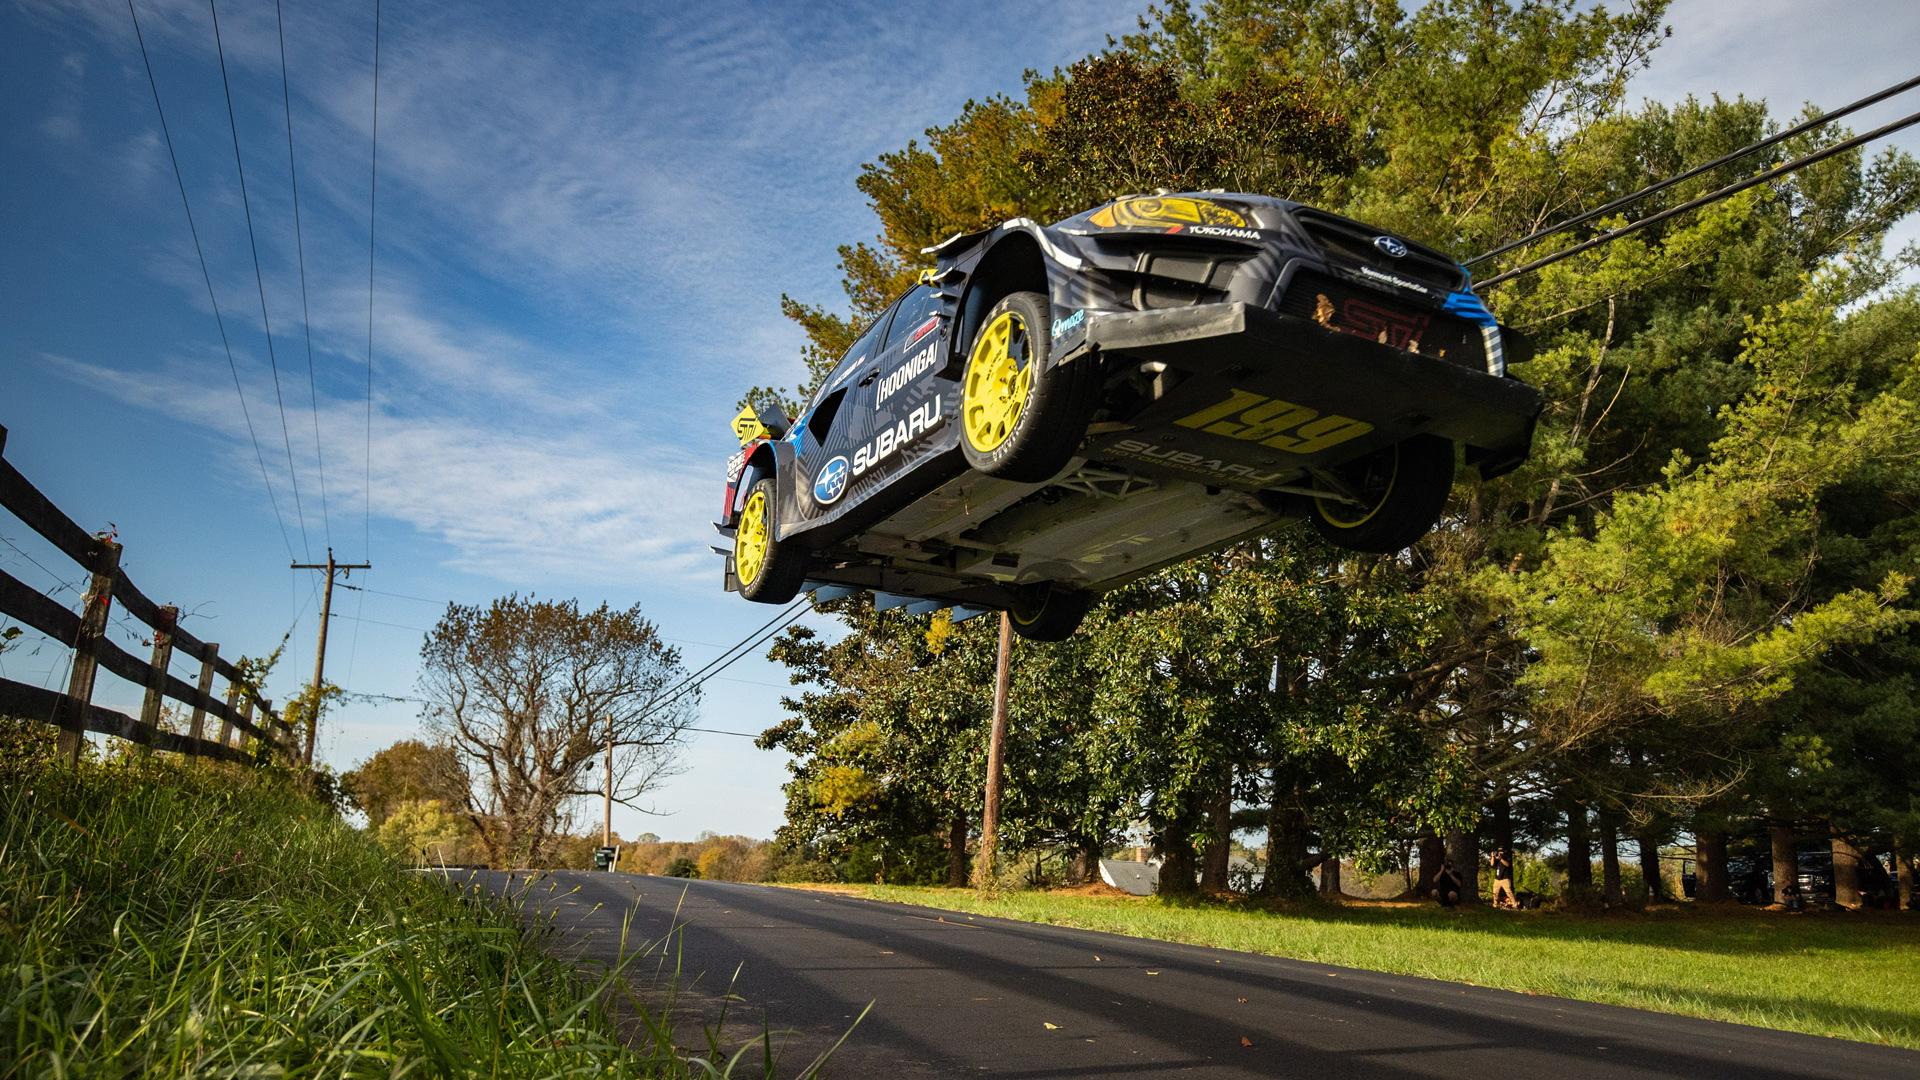 Gymkhana 2020 featuring Travis Pastrana in a custom Subaru WRX STI